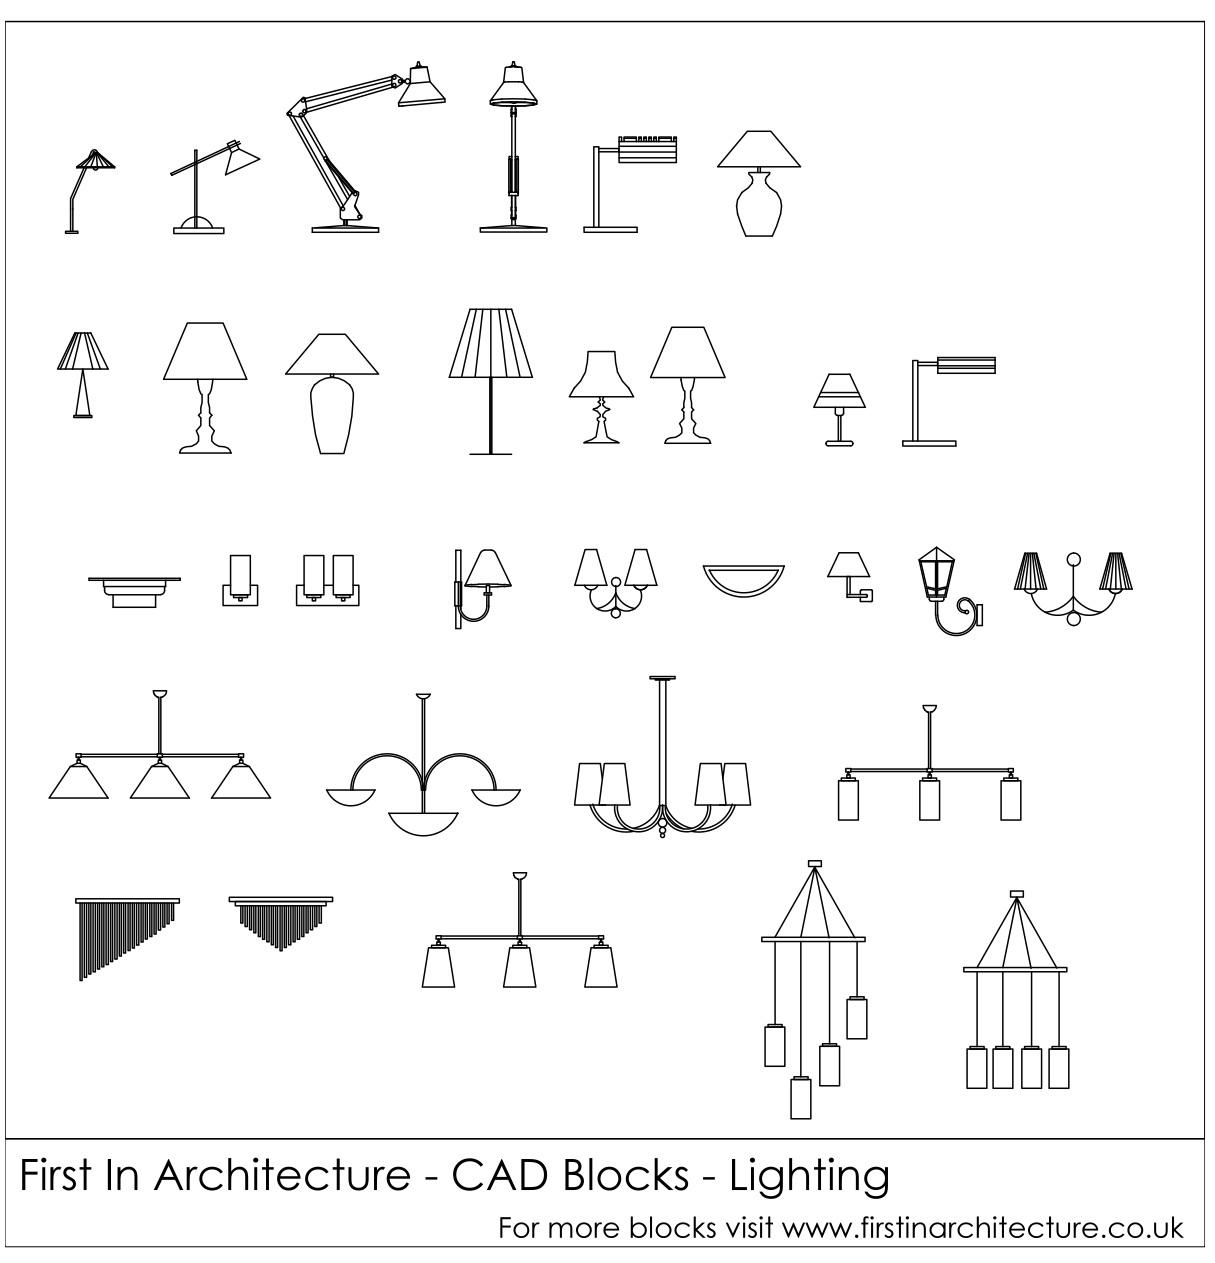 Free Cad Blocks Lighting